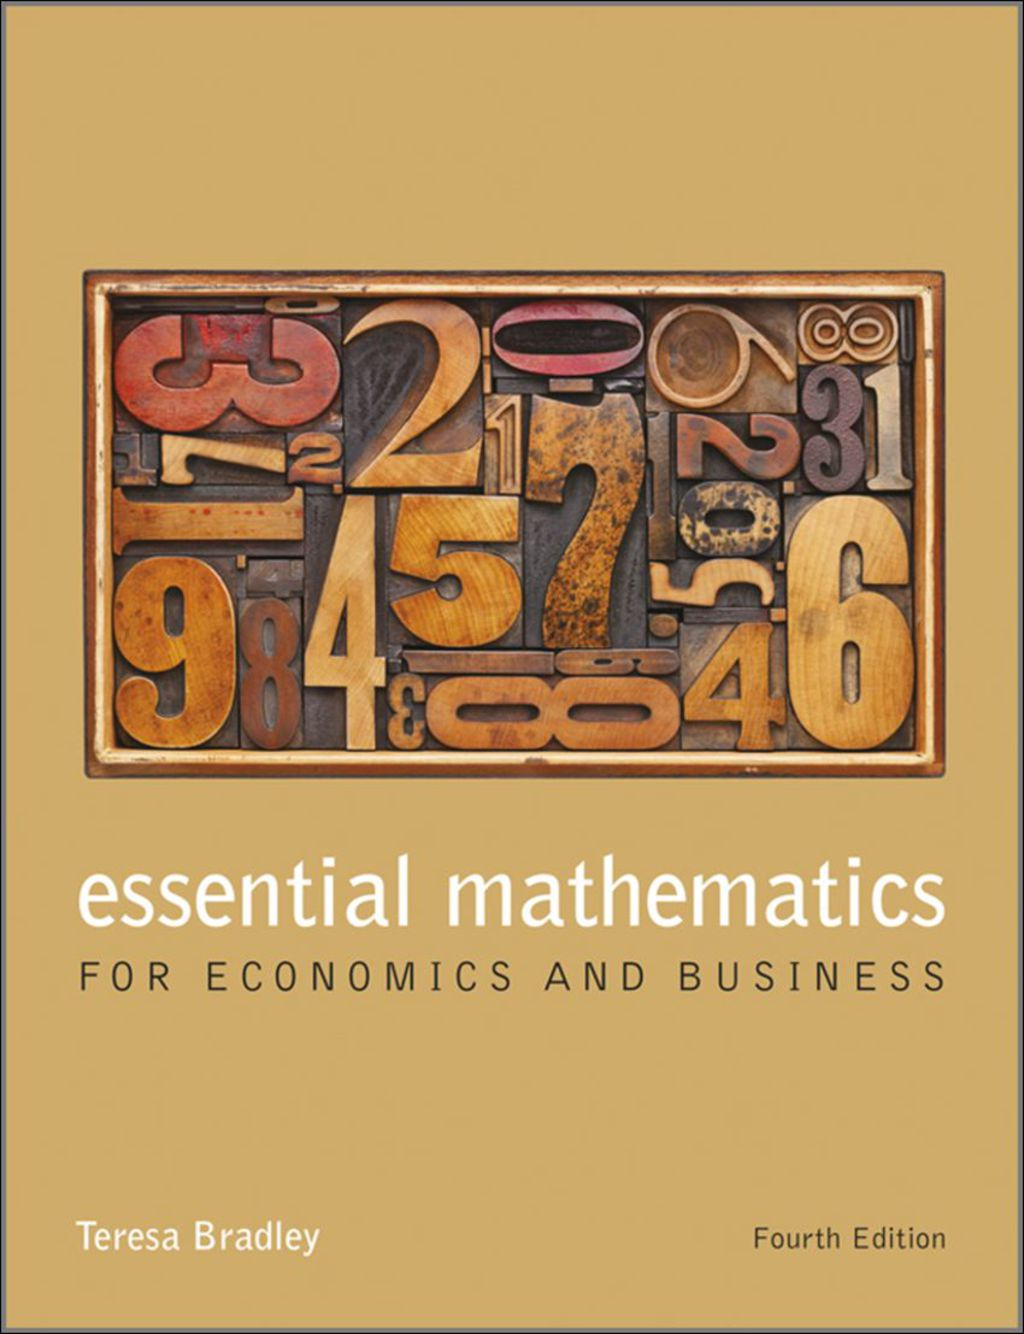 Essential Mathematics for Economics and Business (eBook Rental)